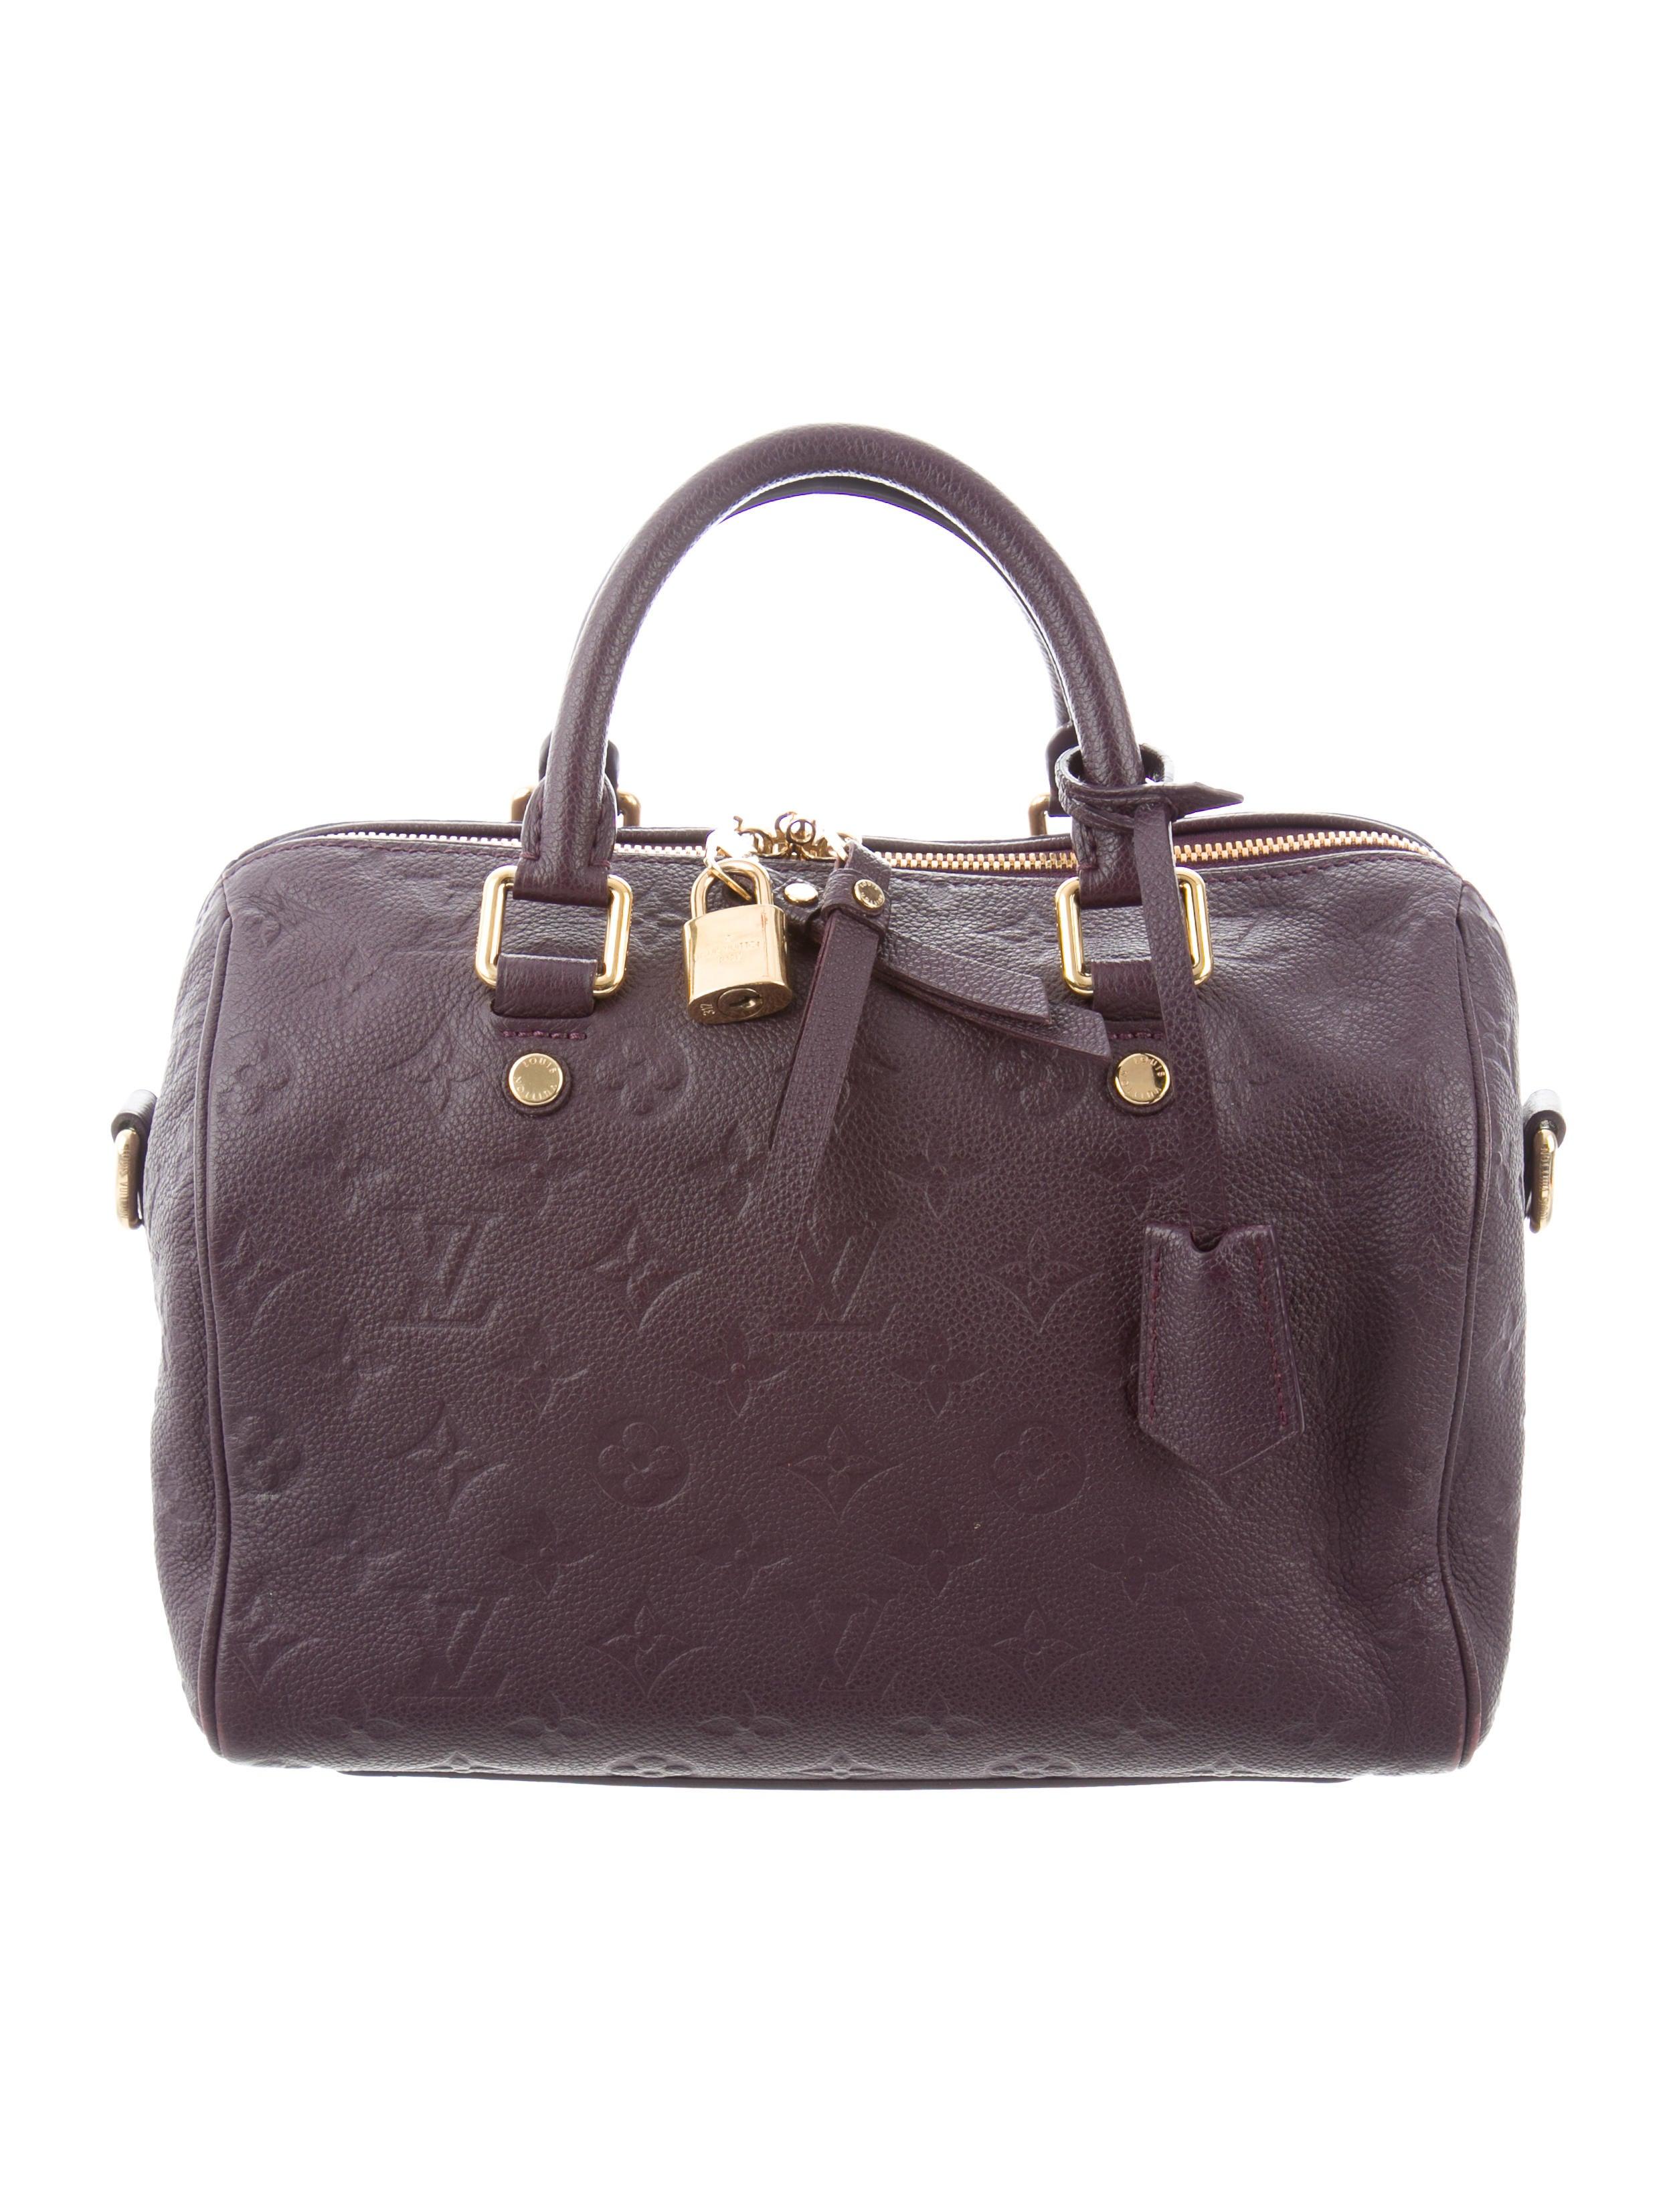 2d19bed47910 Louis Vuitton Empreinte Speedy Bandoulière 25 - Handbags - LOU218410 ...